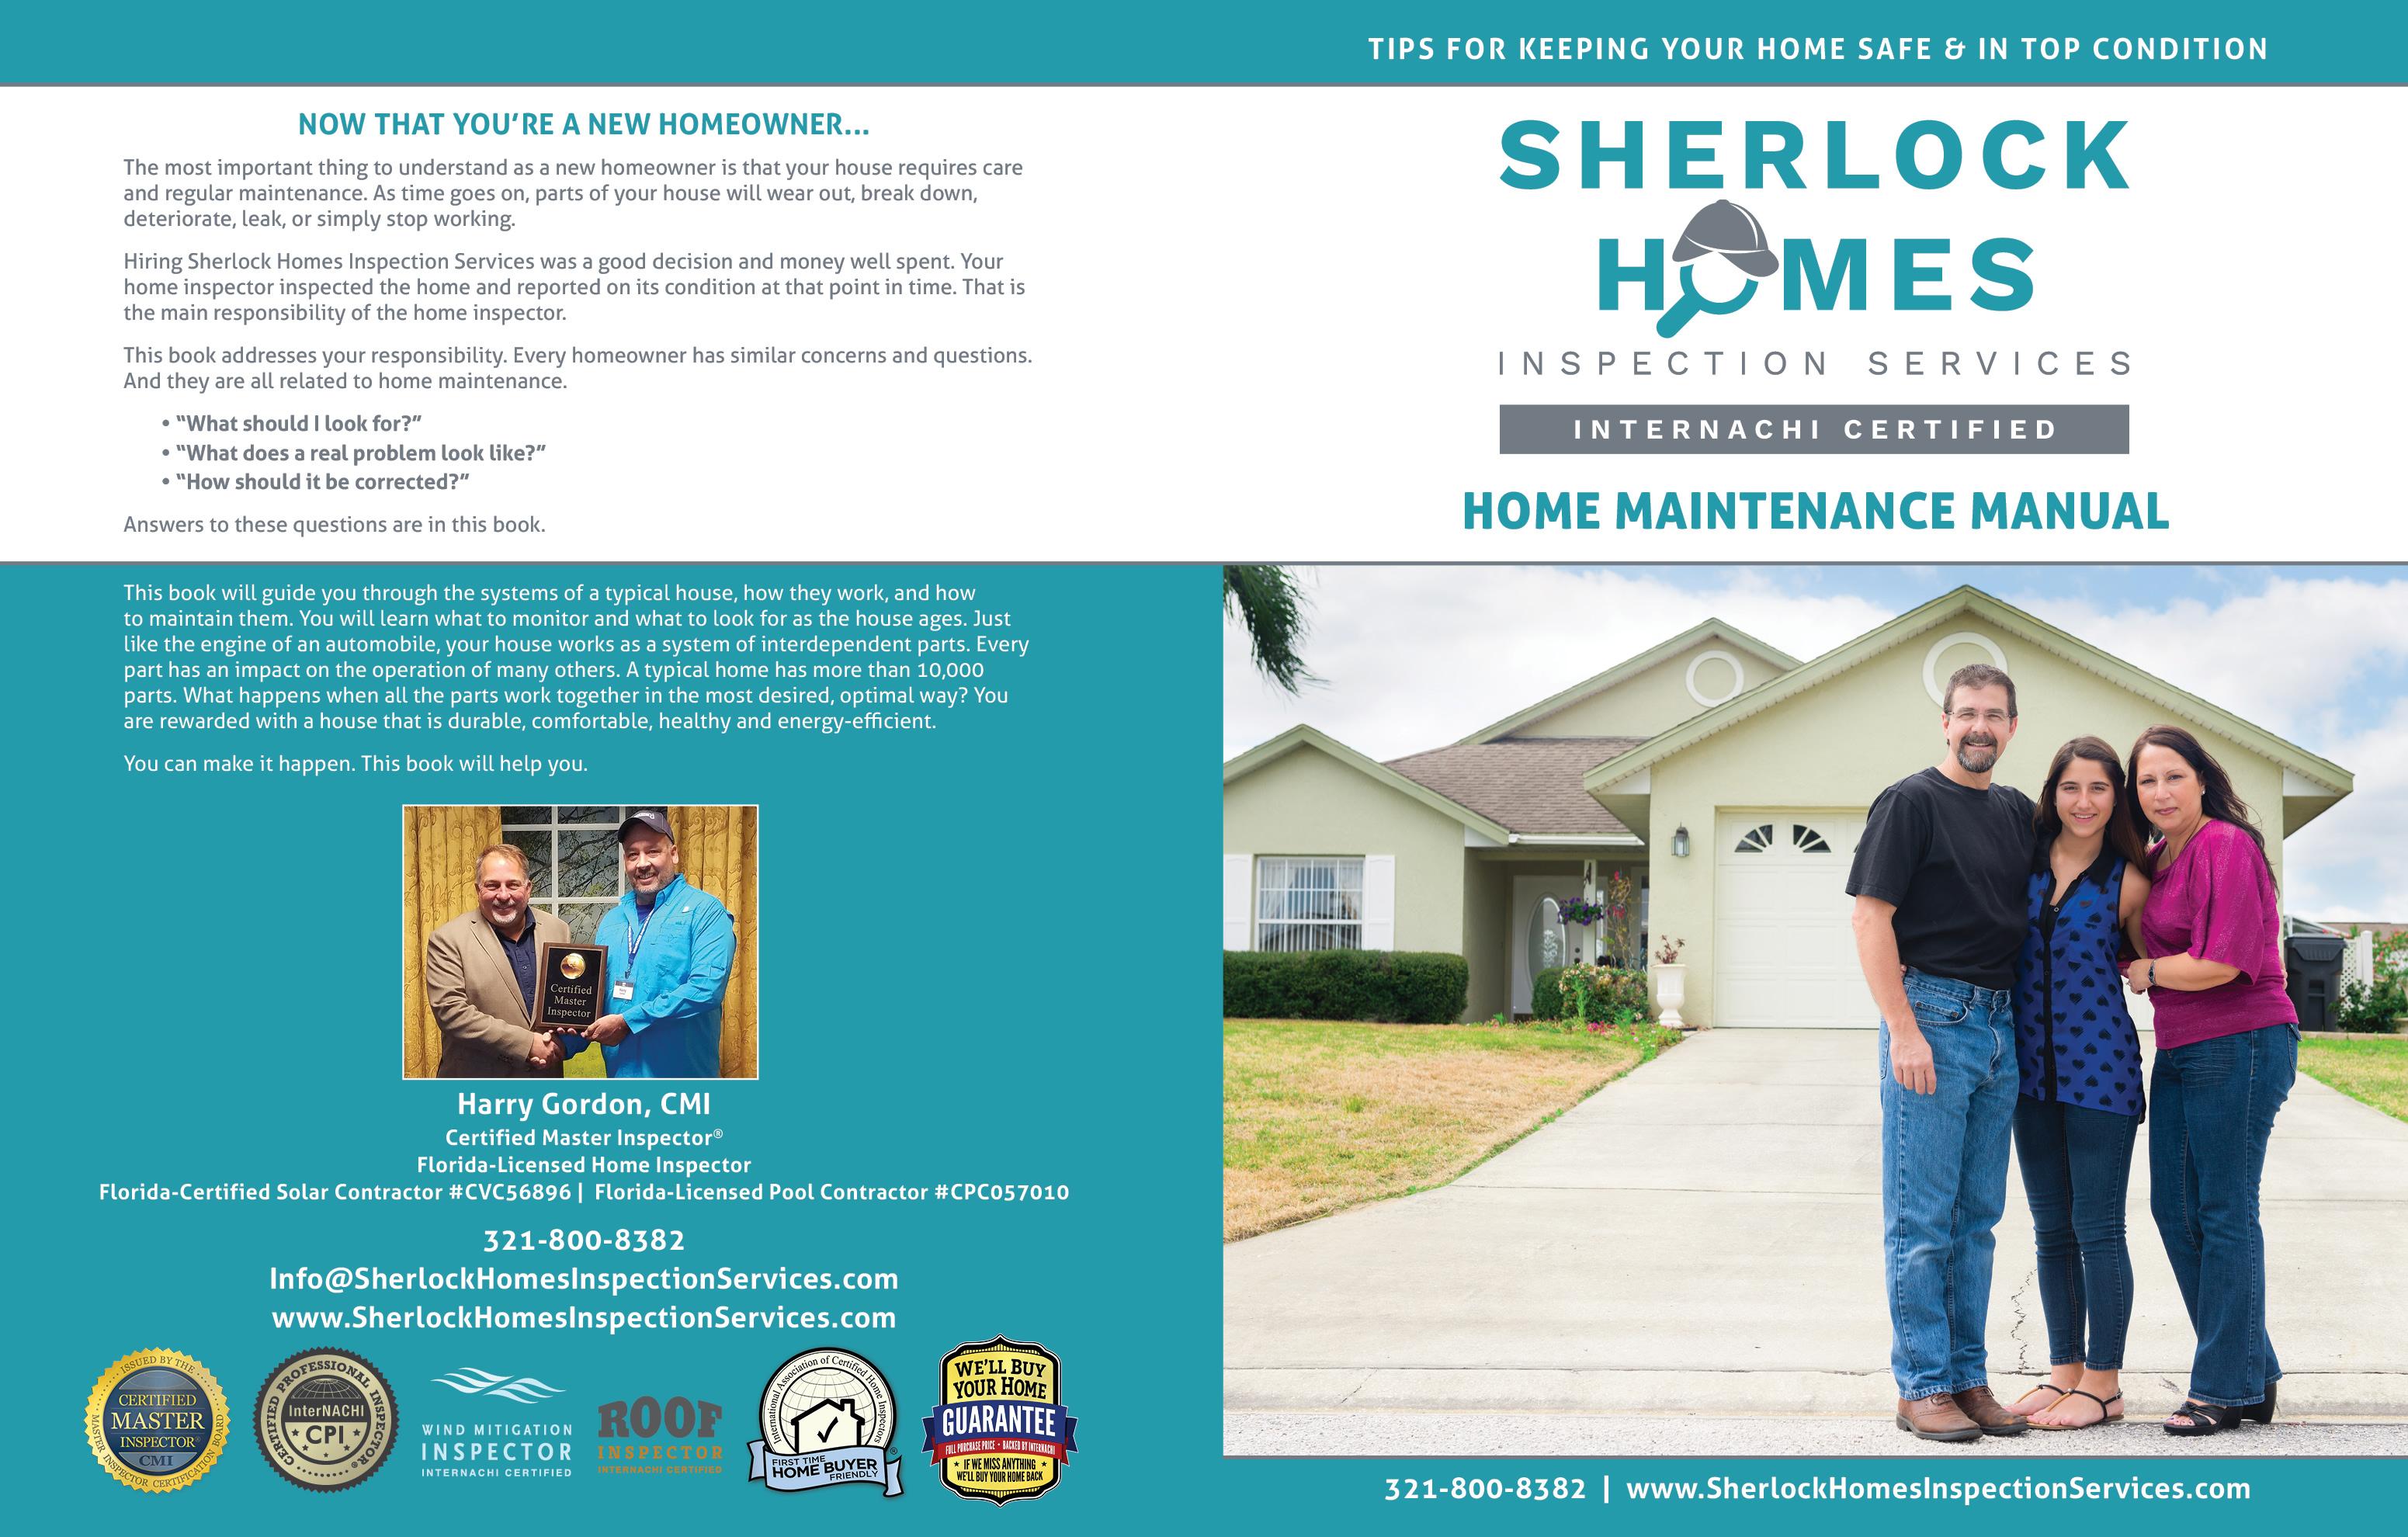 internachi inspection graphics library  custom home maintenance books  u00bb custom books for